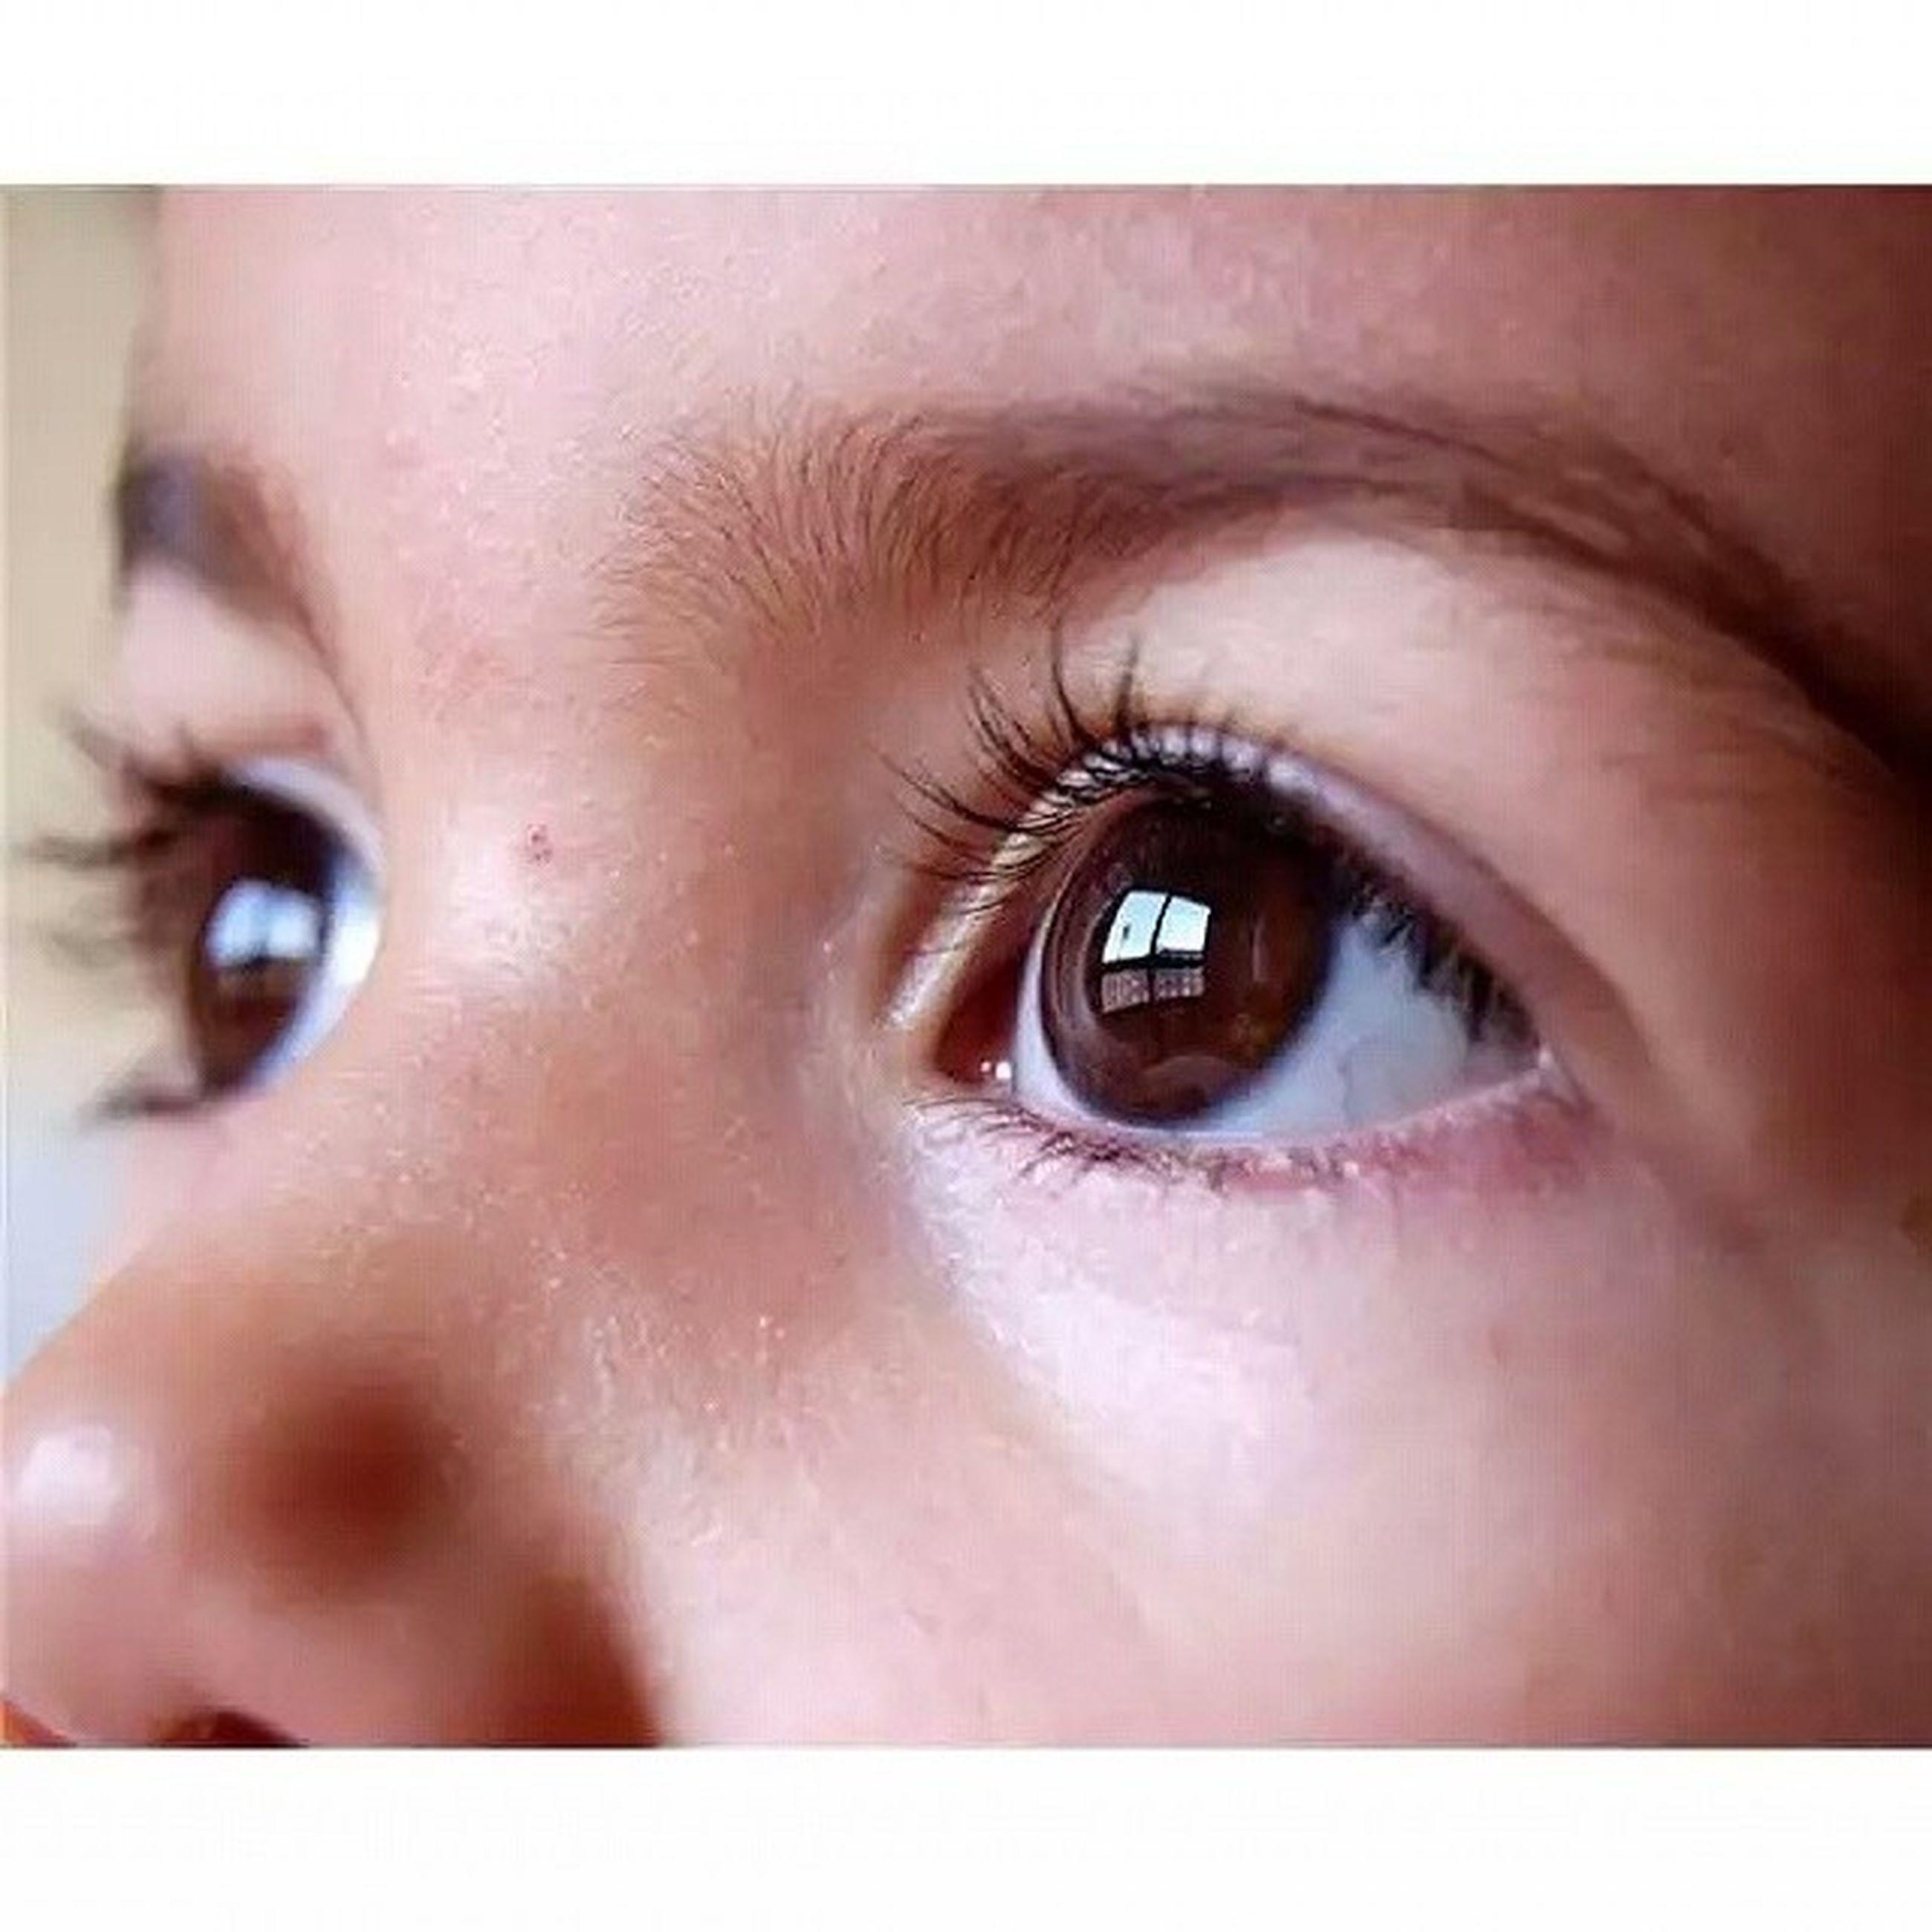 human eye, close-up, eyelash, human face, looking at camera, part of, human skin, sensory perception, portrait, eyesight, lifestyles, headshot, auto post production filter, extreme close-up, extreme close up, eyebrow, transfer print